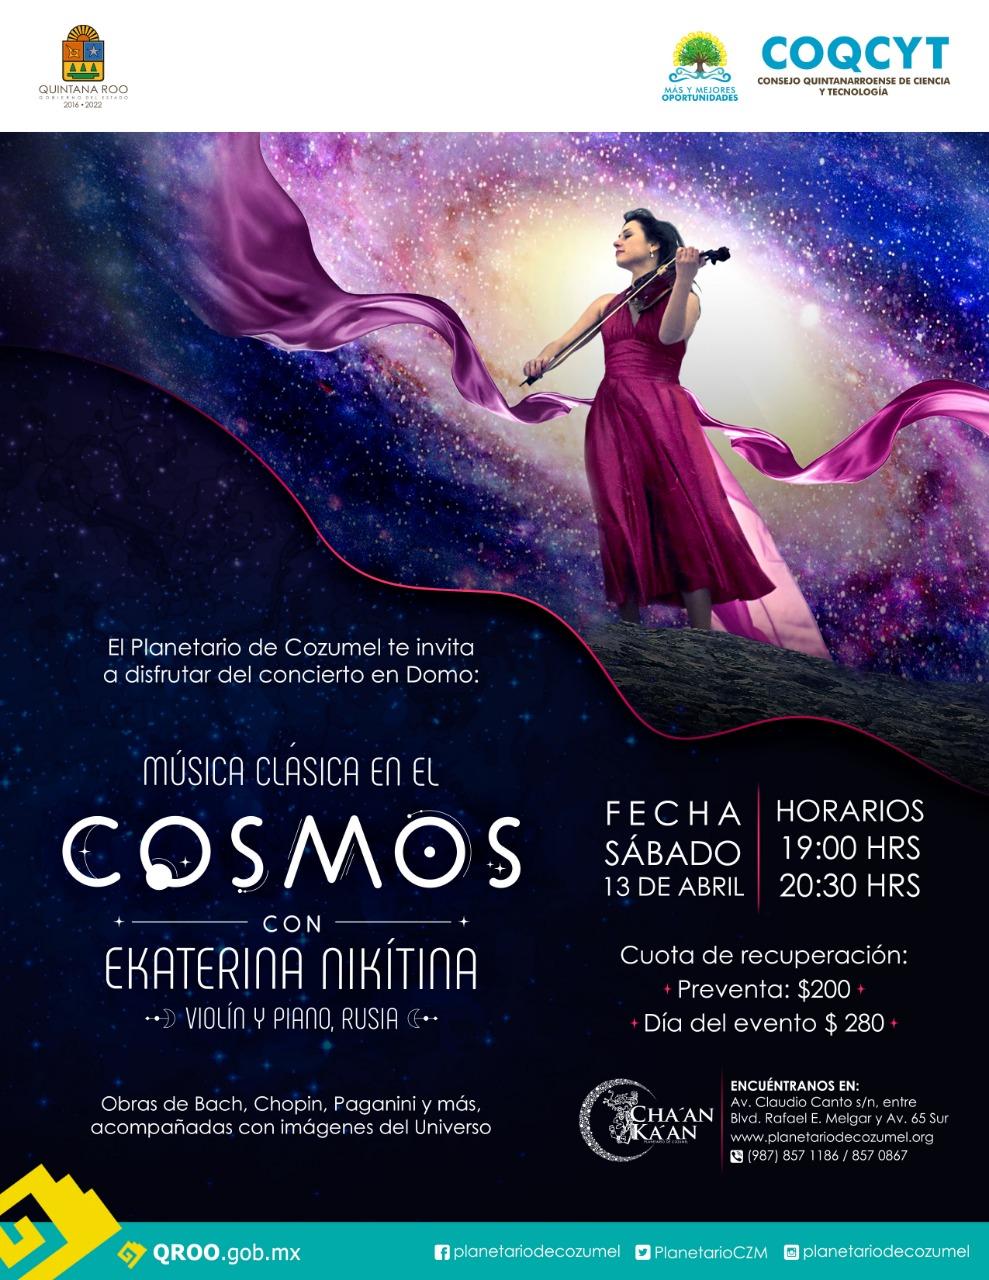 Cozumel Planetarium - Classic Music in the Cosmos - Ekaterina Nikitina 2019